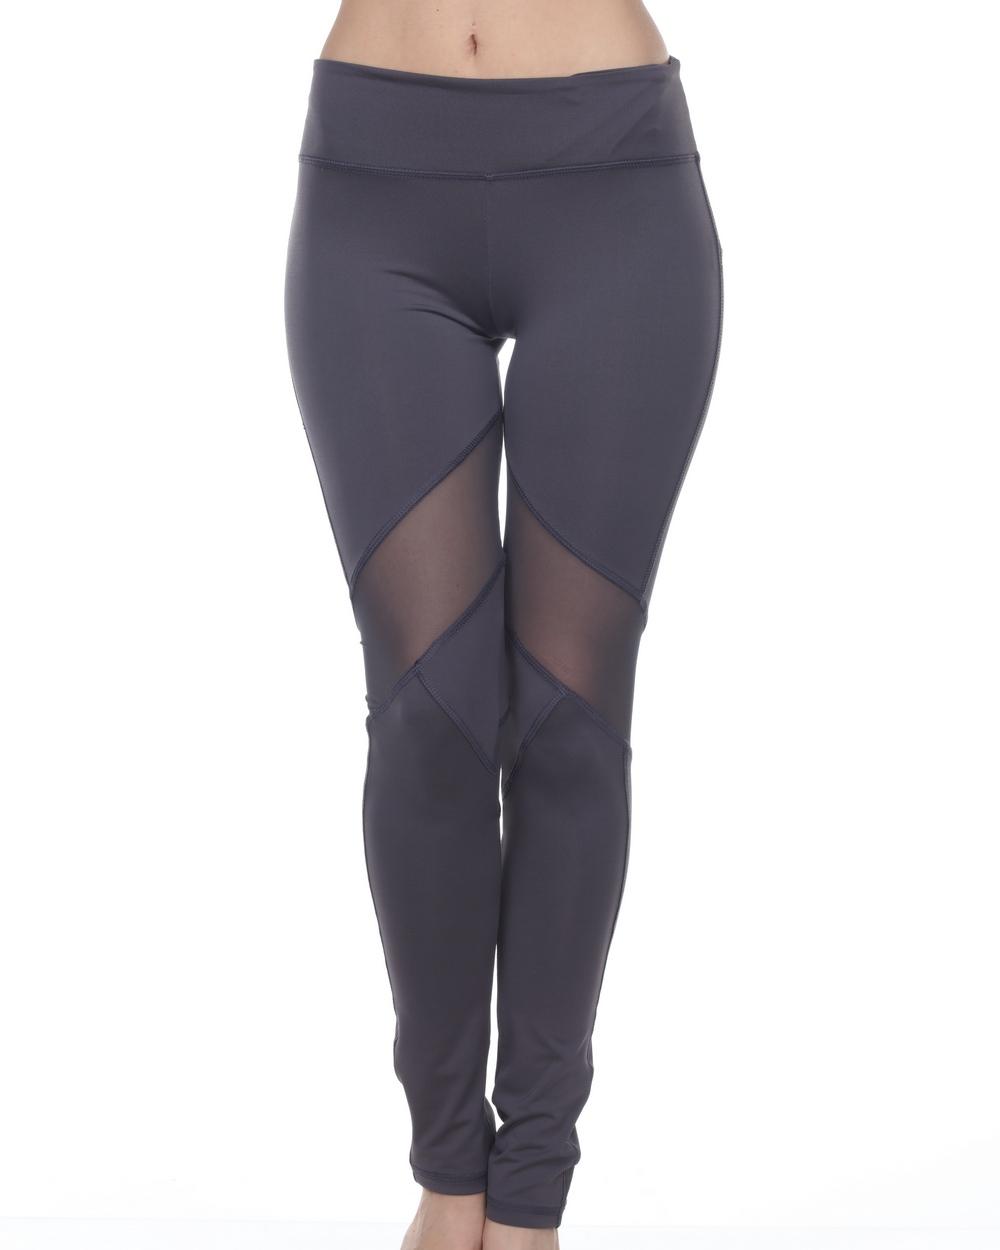 2016 Electric Yoga V-Line Mesh Legging in Charcoal